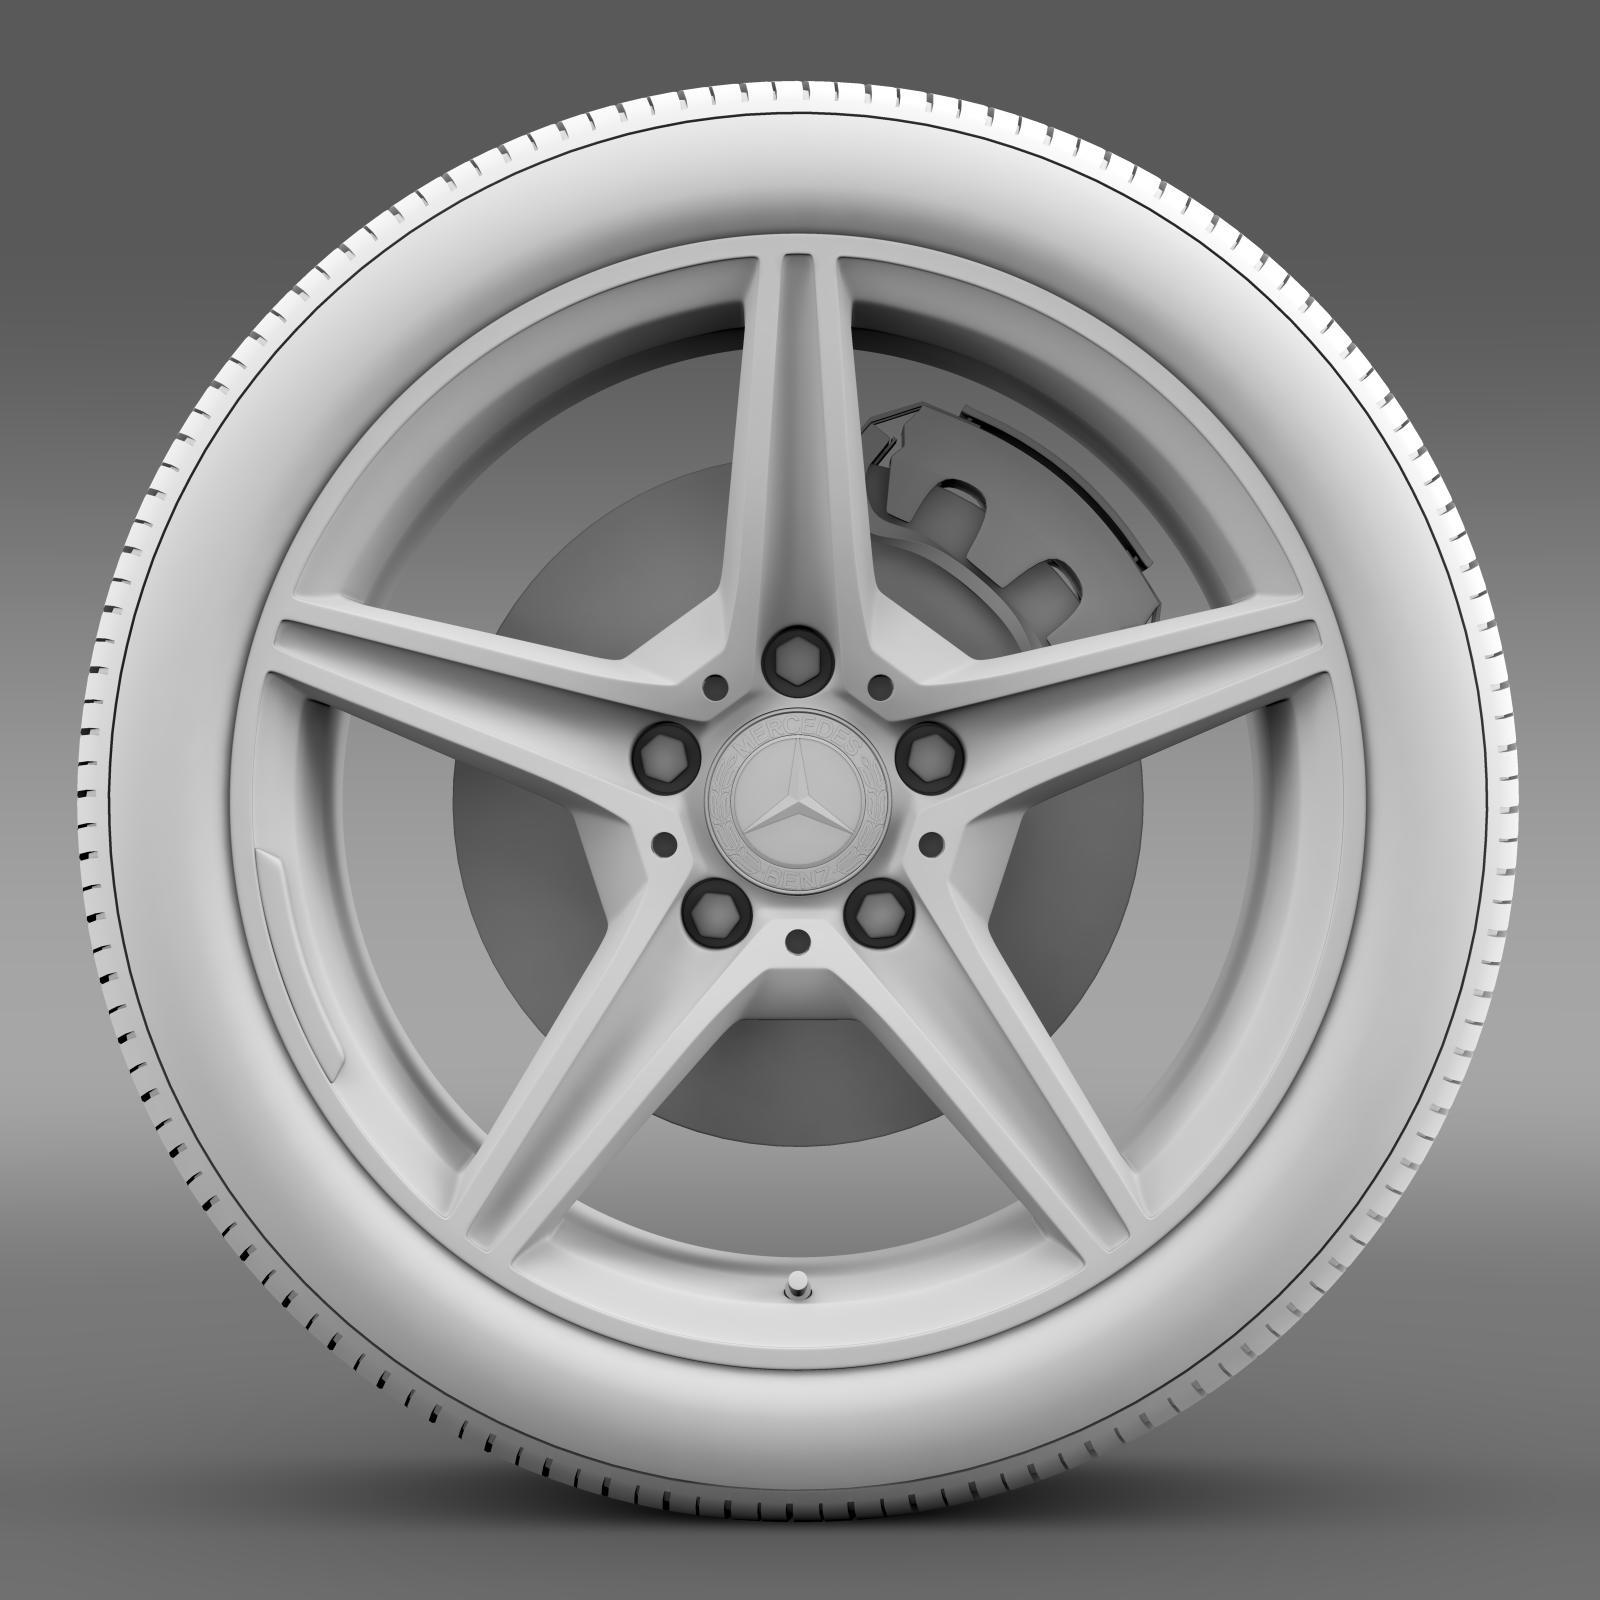 mercedes benz c 400 4matic amg line wheel 3d model 3ds max fbx c4d lwo ma mb hrc xsi obj 210791